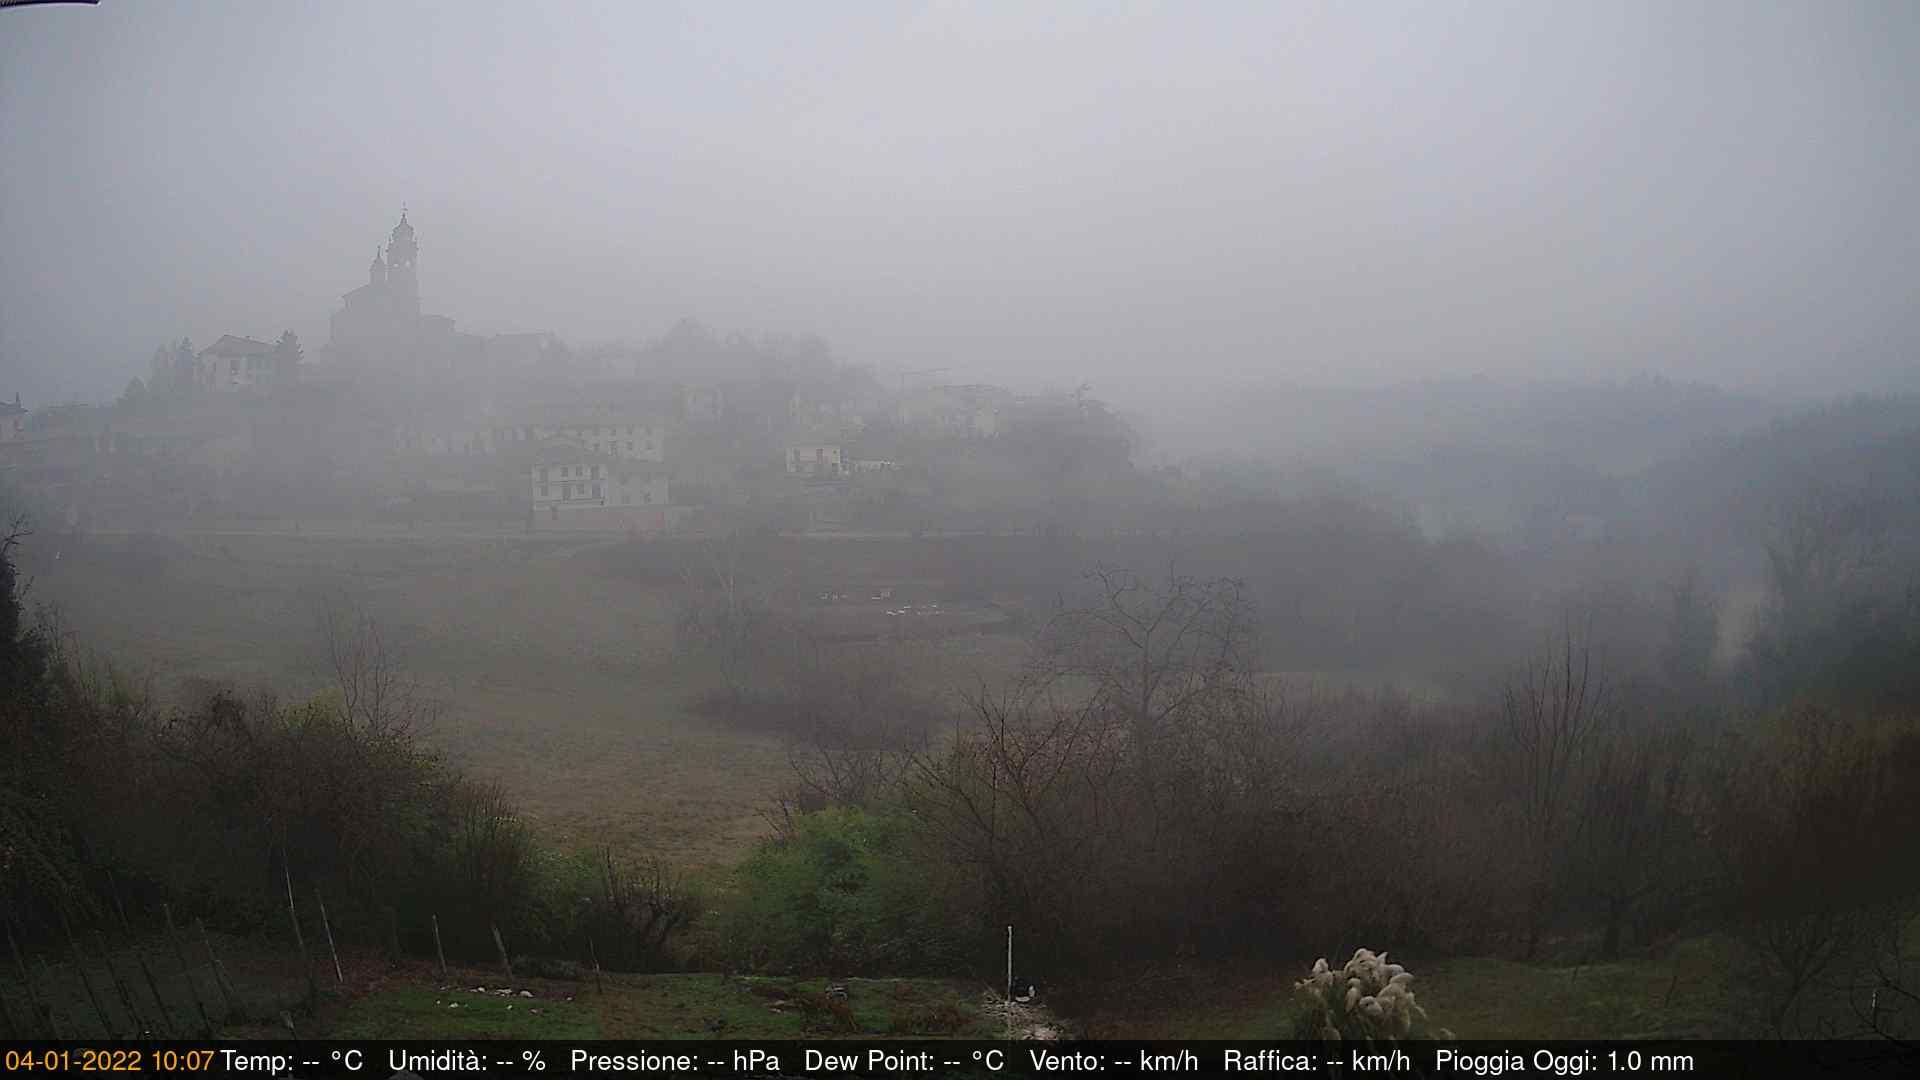 webcam piovà massaia - piovà massaia - chiesa cardinal massaia - monferrato - panorama - www.meteopiova.altervista.org